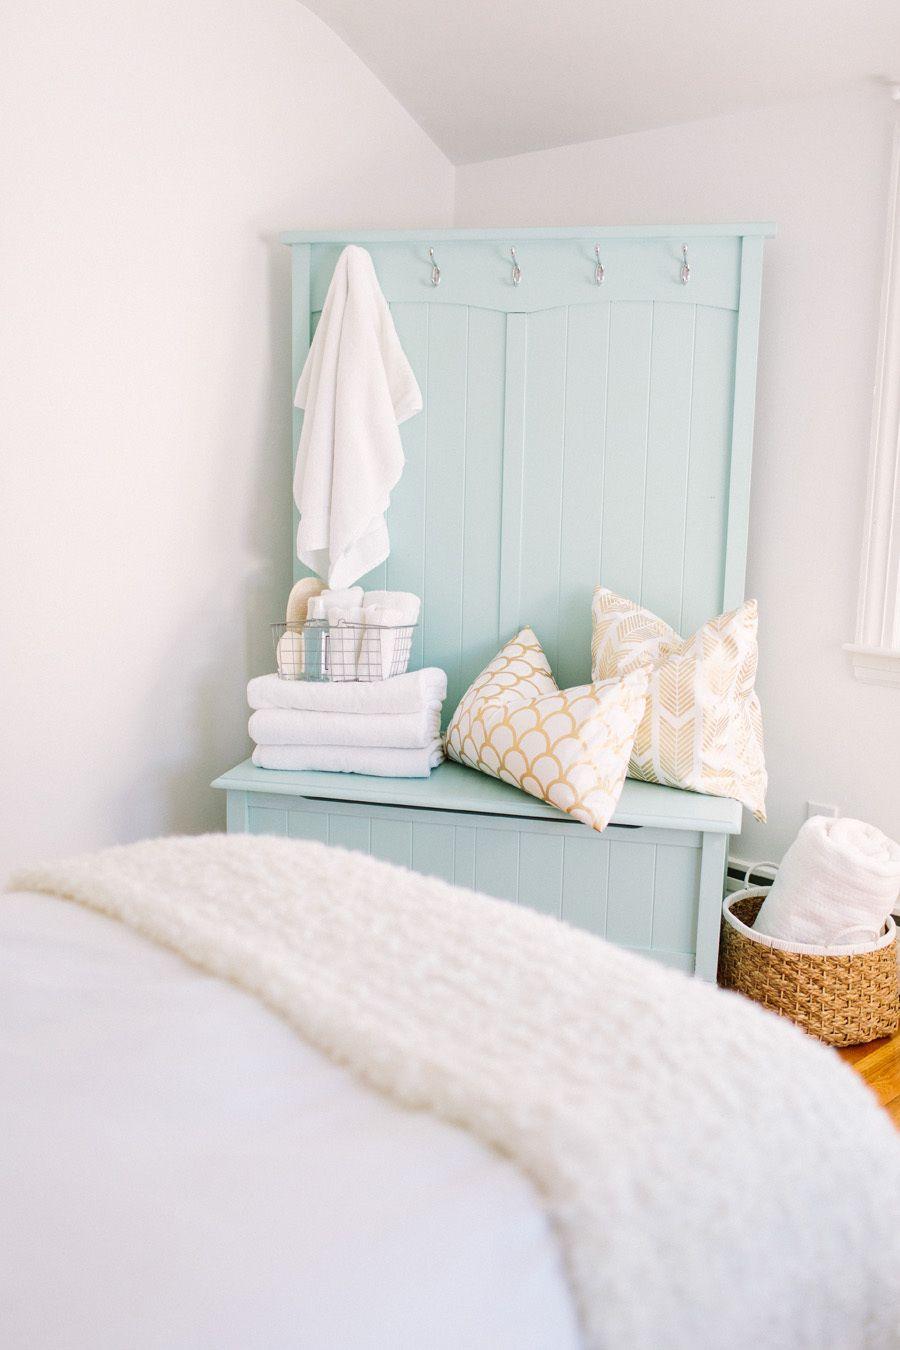 Kinderzimmer decke design weekend room edit  bedroom  mint and cream  pinterest